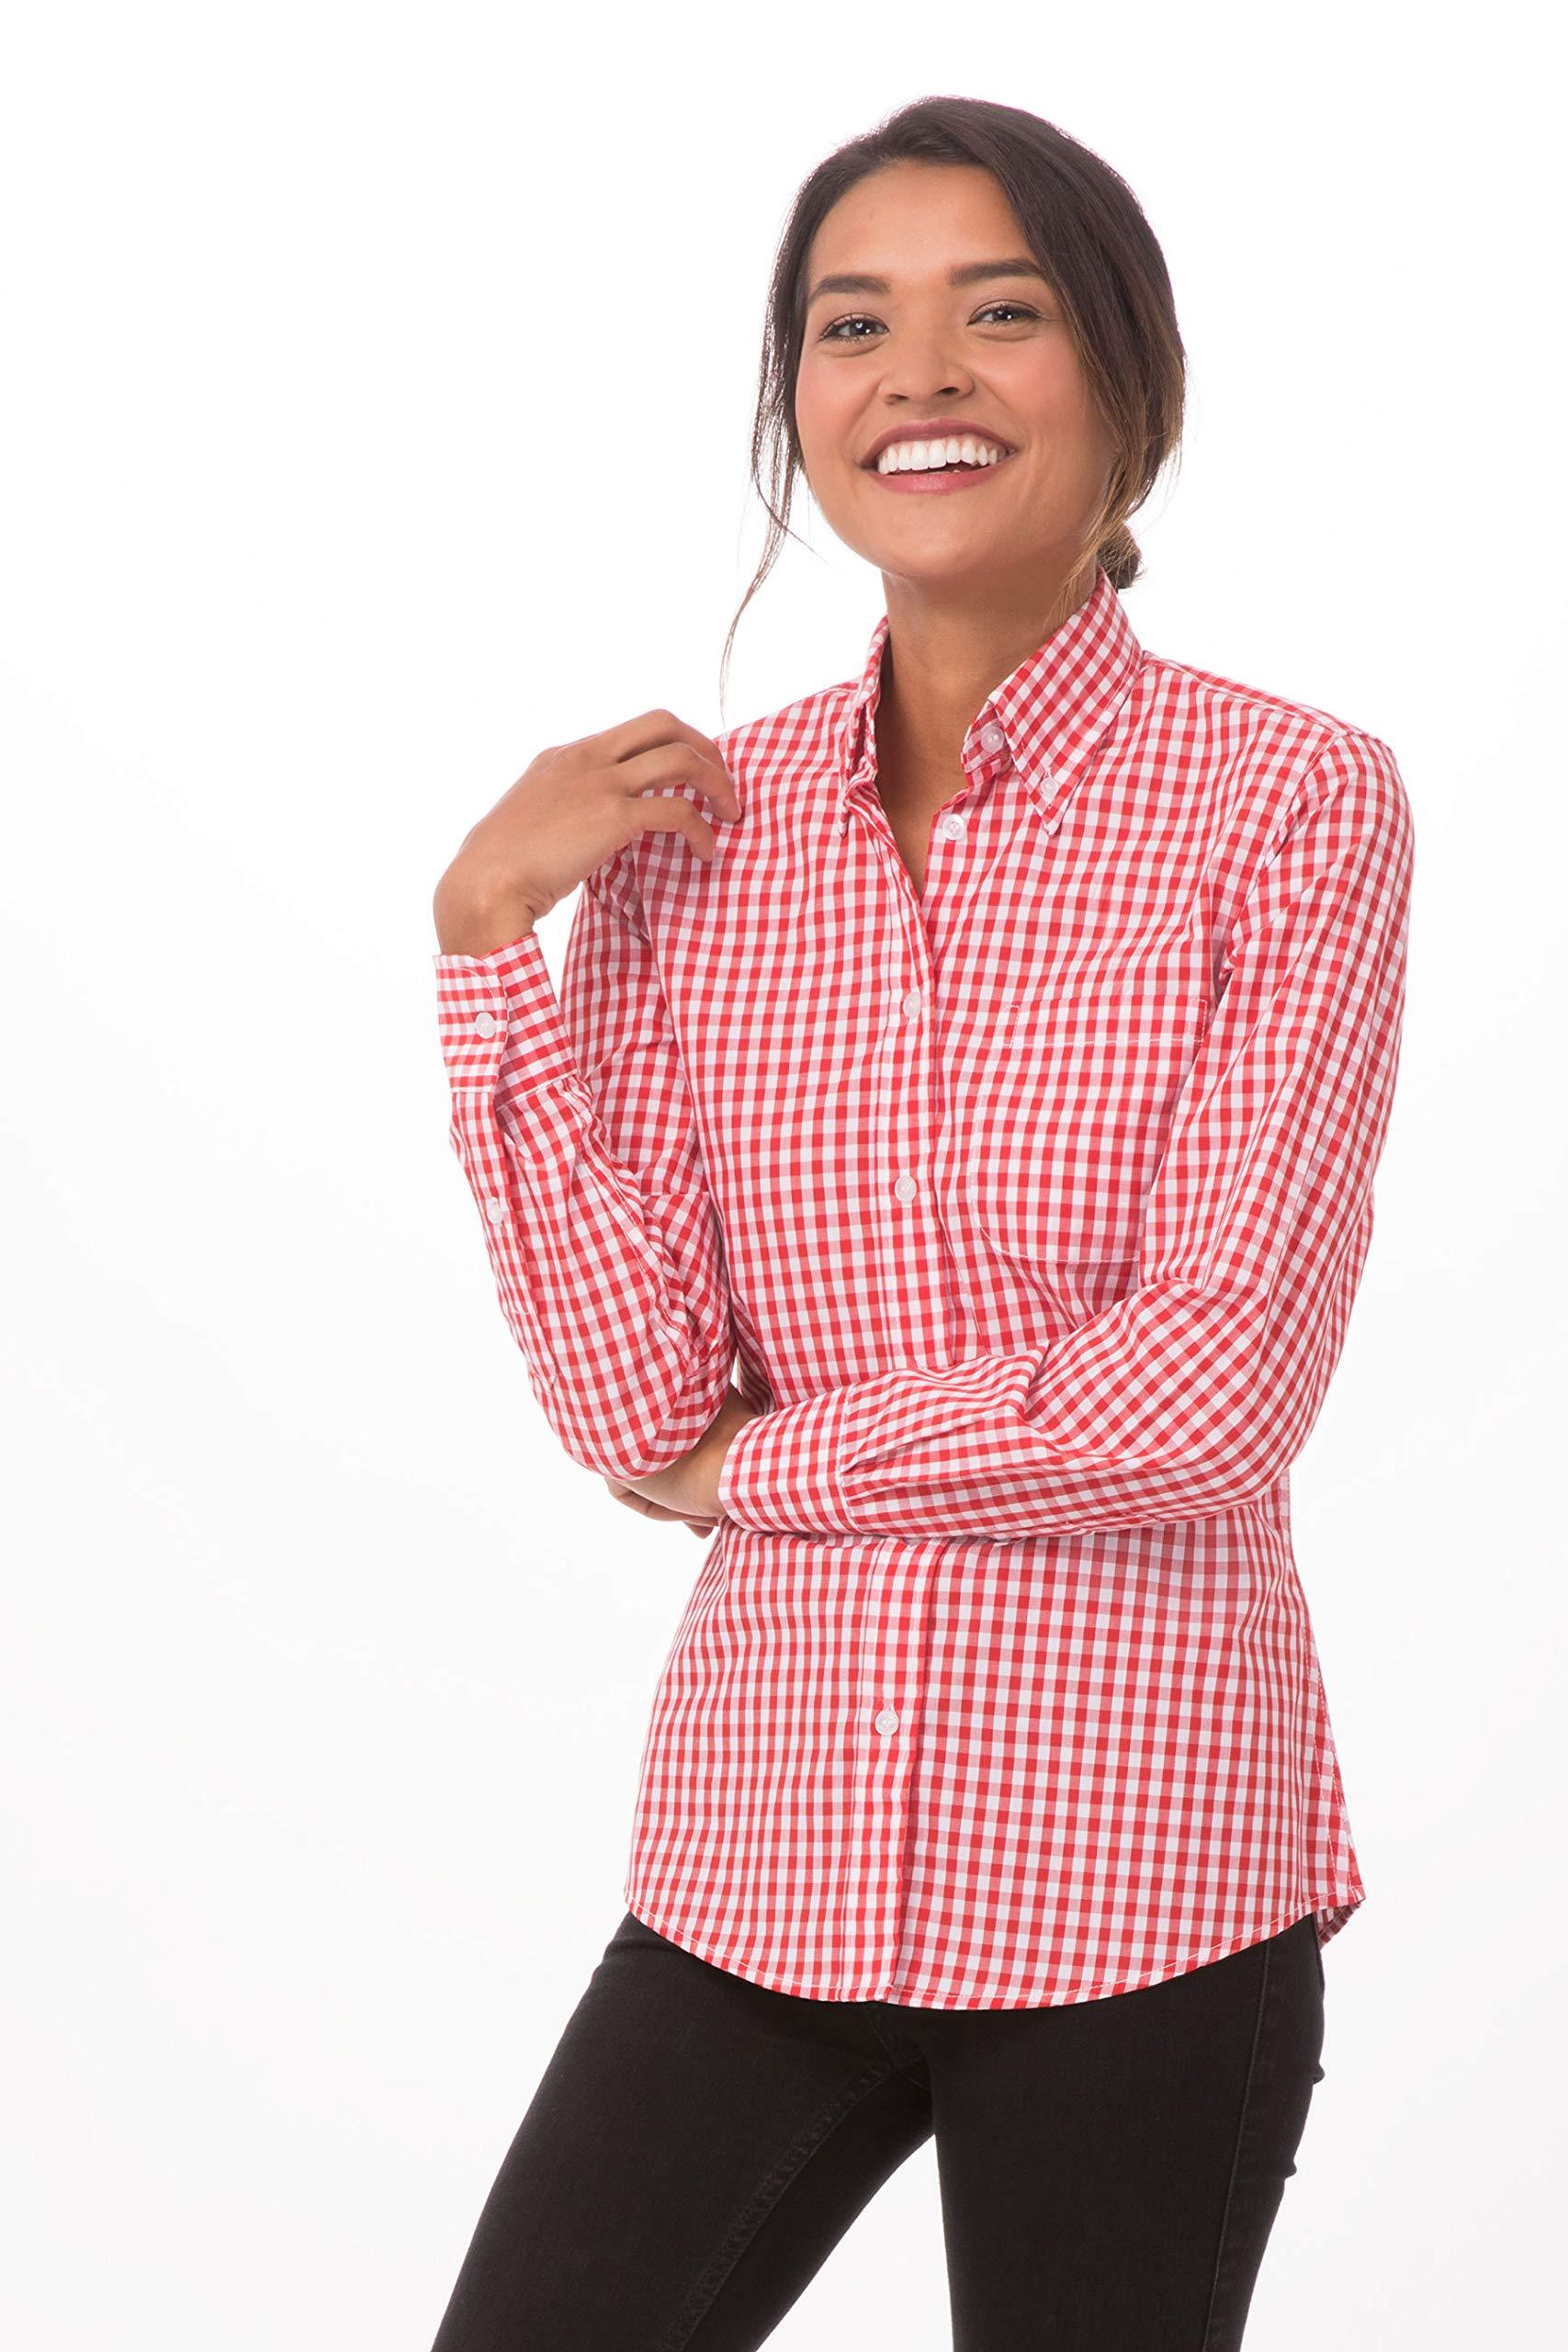 Chef Works Women's Medium Gingham Dress Shirt, Red & White Check, Medium by Chef Works